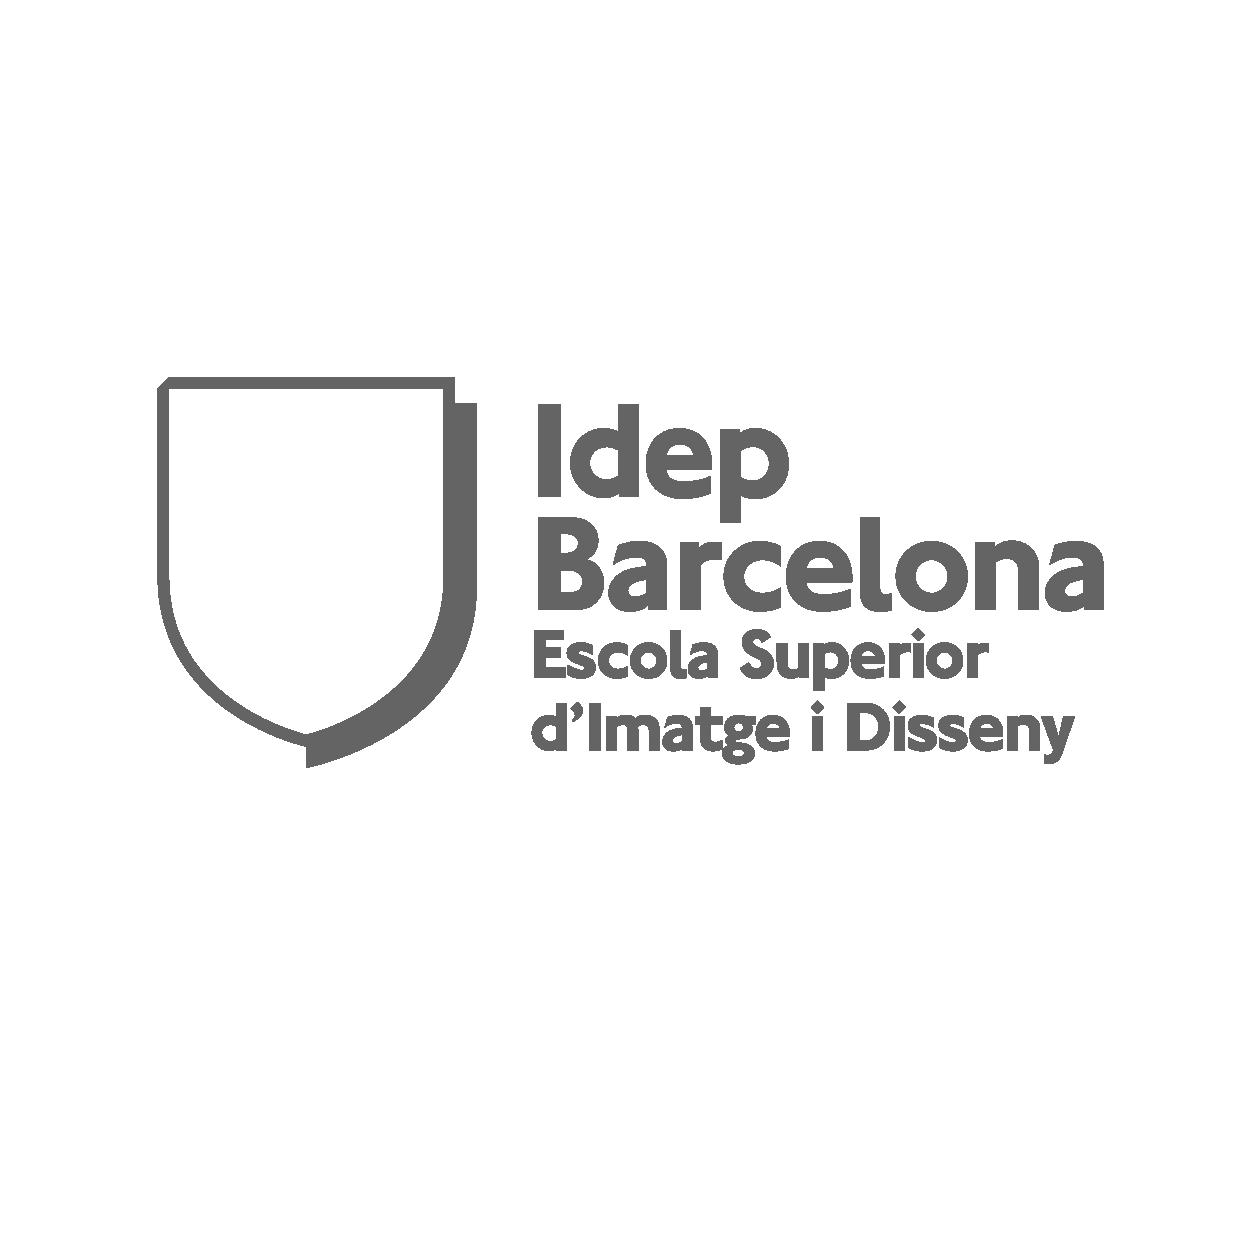 logo_Idep_Barcelona.png